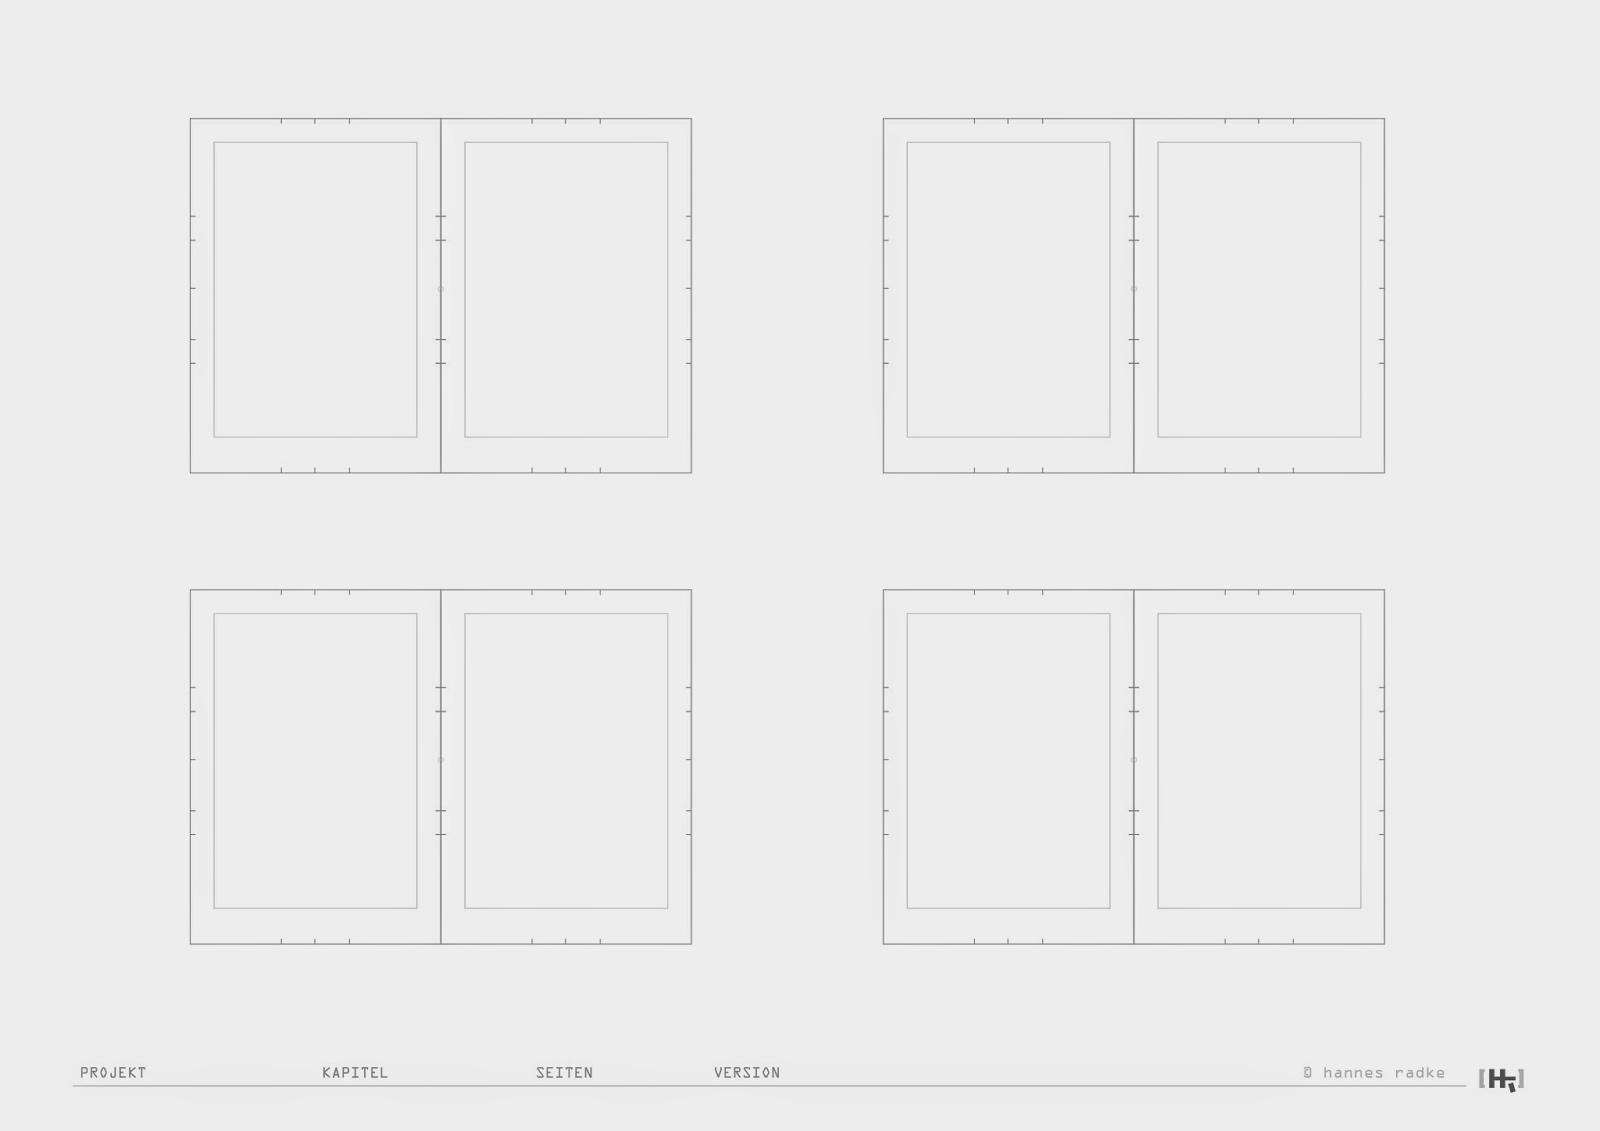 Charmant Seiten Storyboard Vorlage Fotos - Entry Level Resume ...